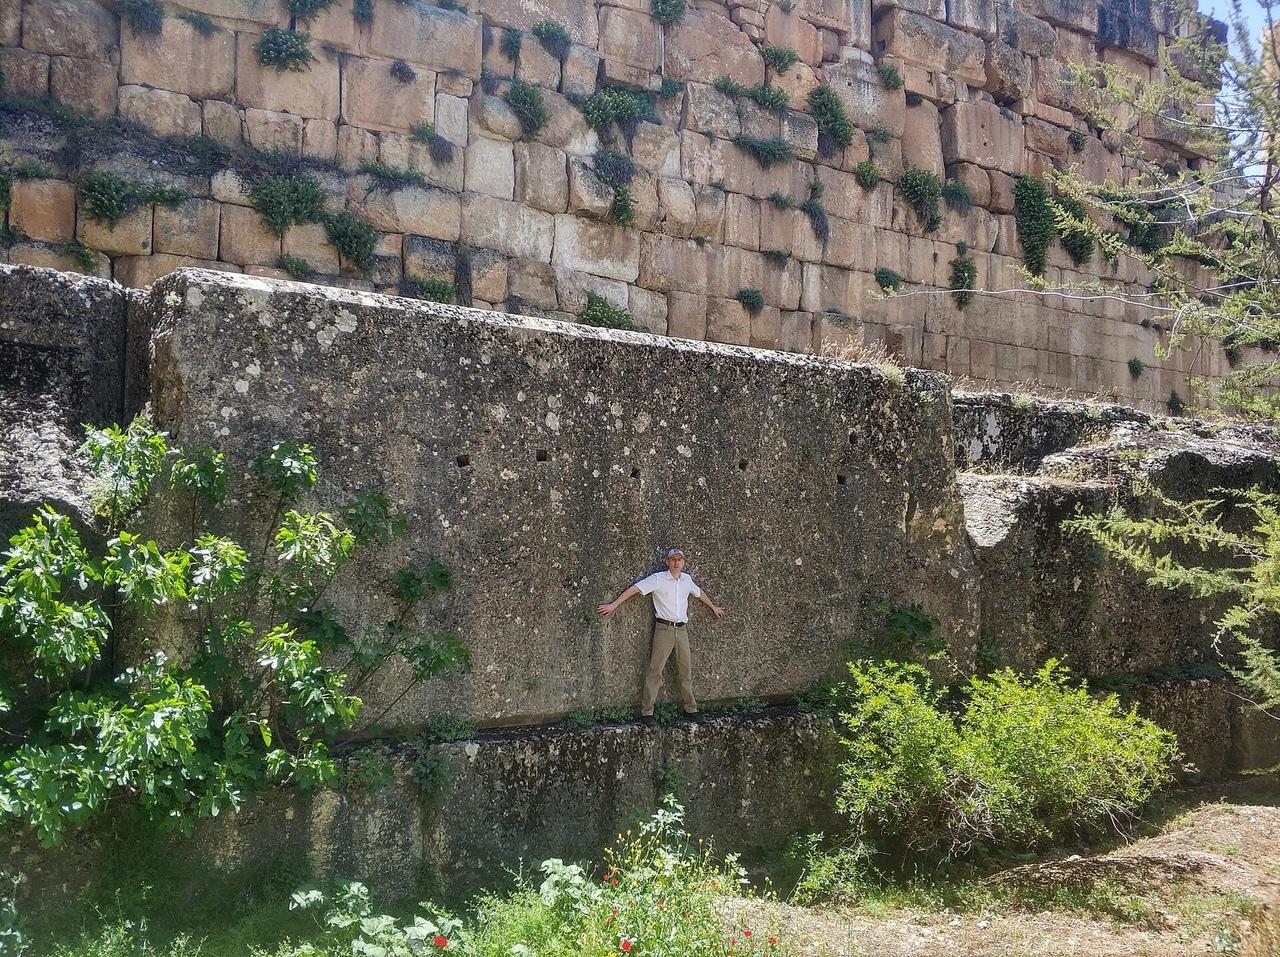 Temple of Jupiter, Baalbek 2